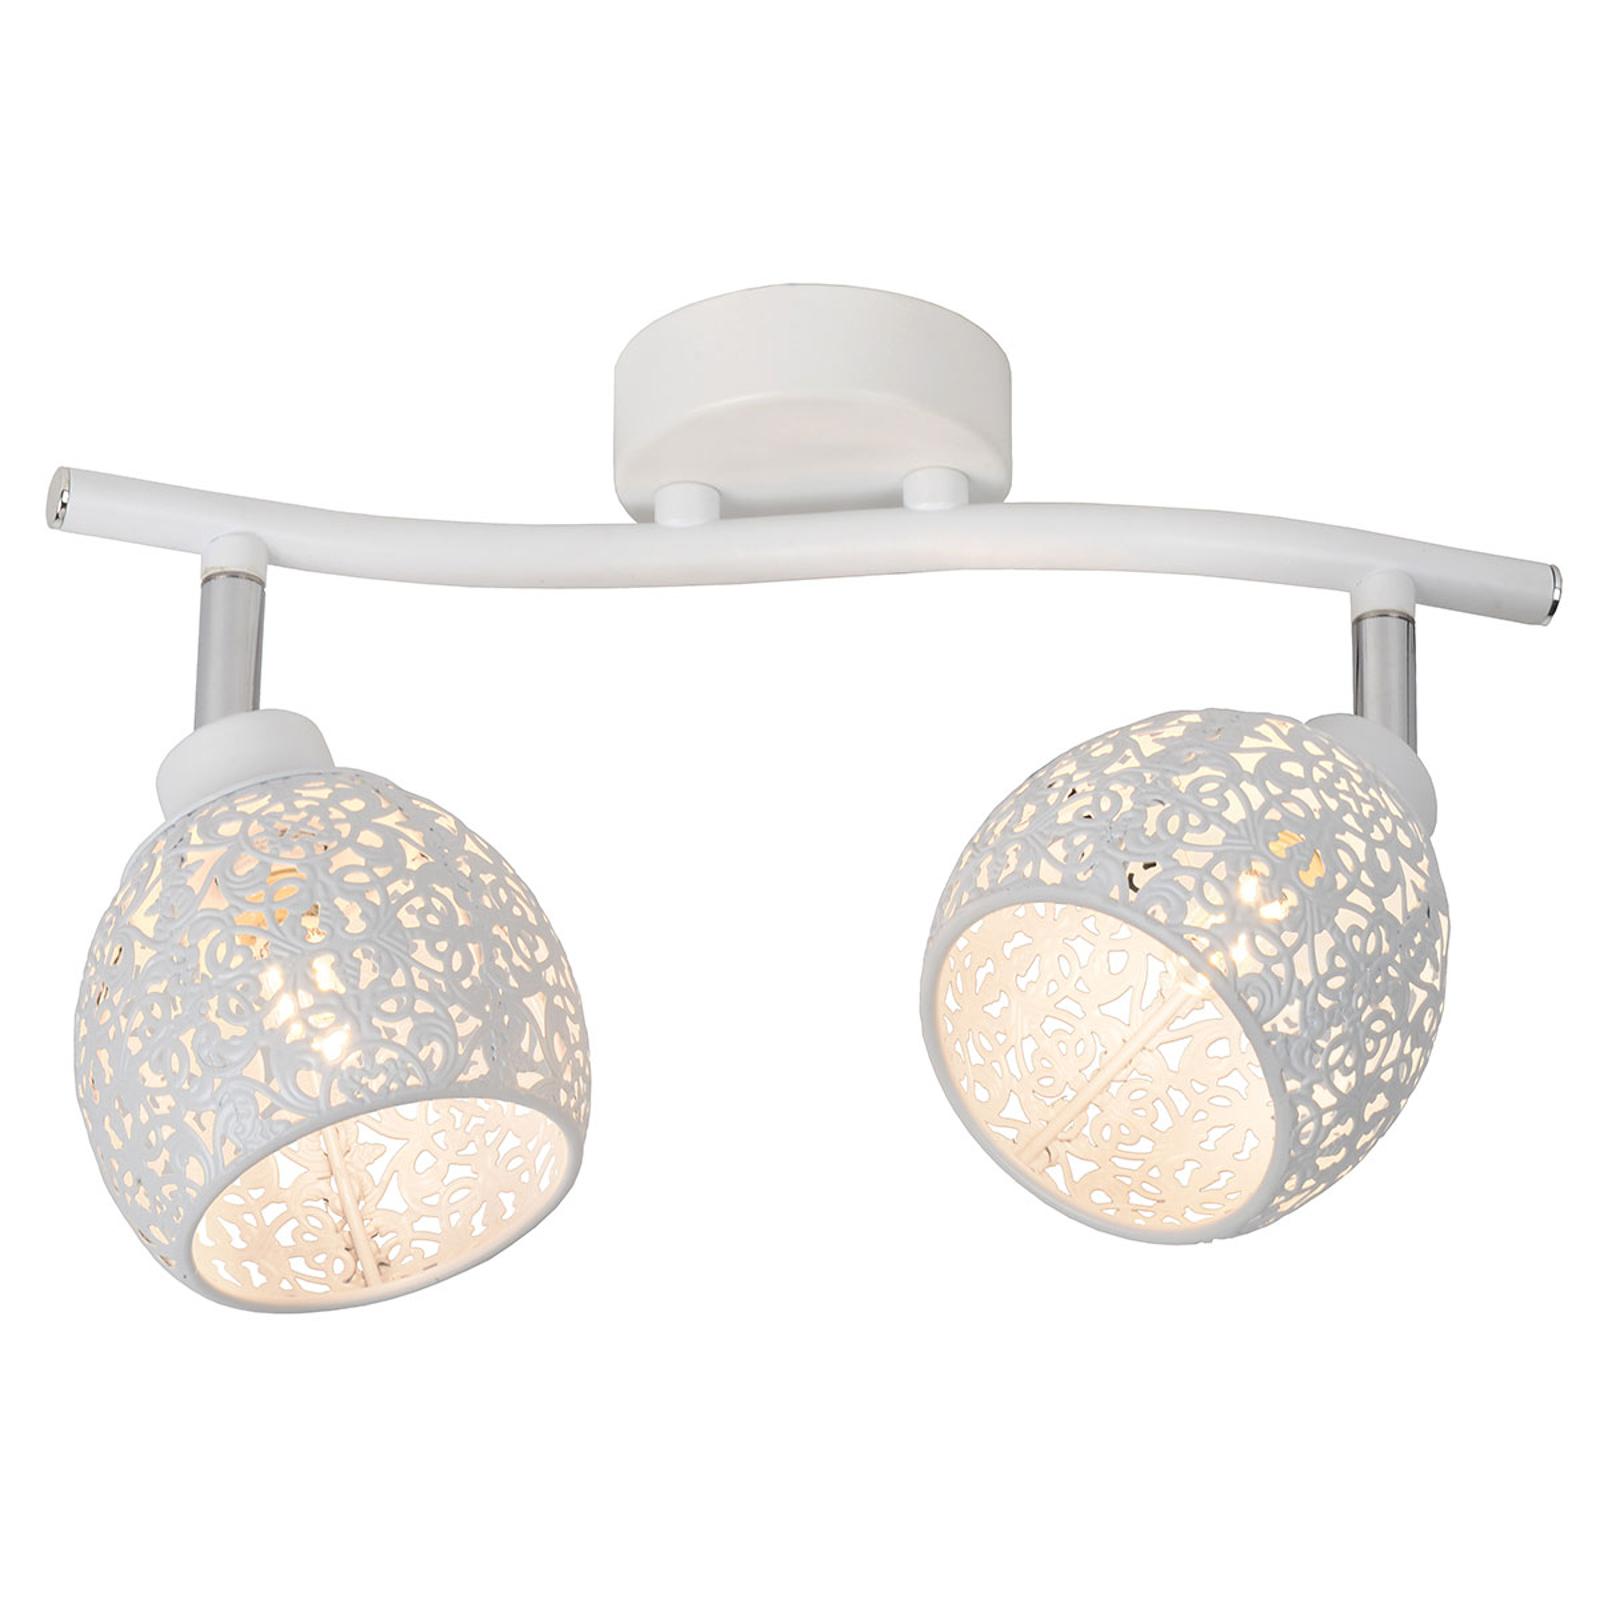 Plafonnier filigrane Tahar à deux lampes